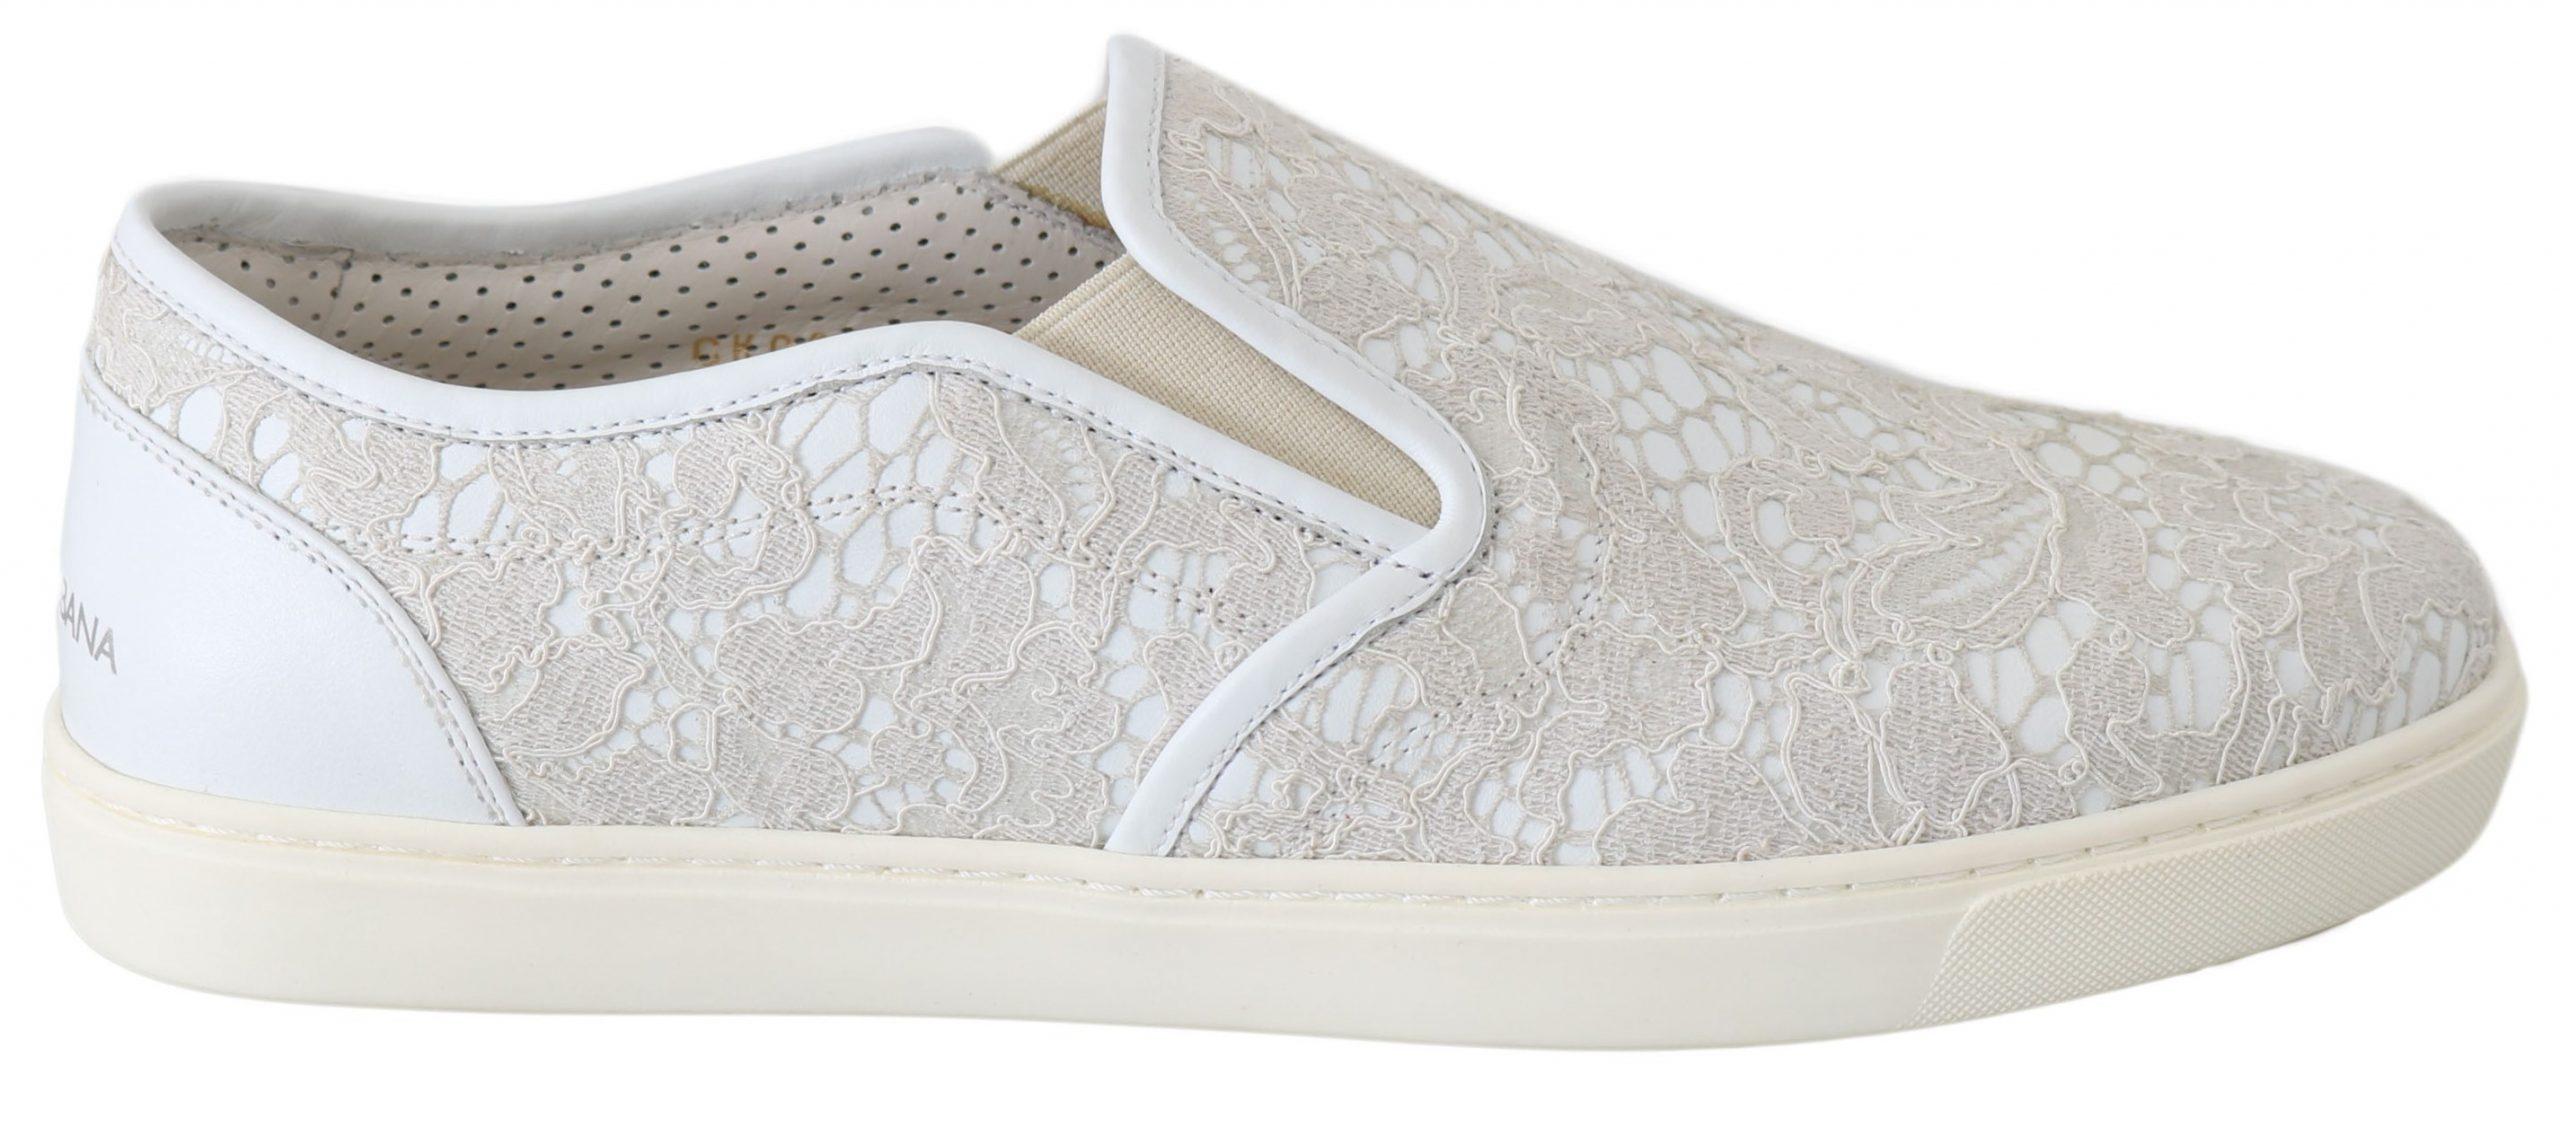 Dolce & Gabbana Women's Leather Lace Slip On Loafers White LA5969 - EU35/US4.5